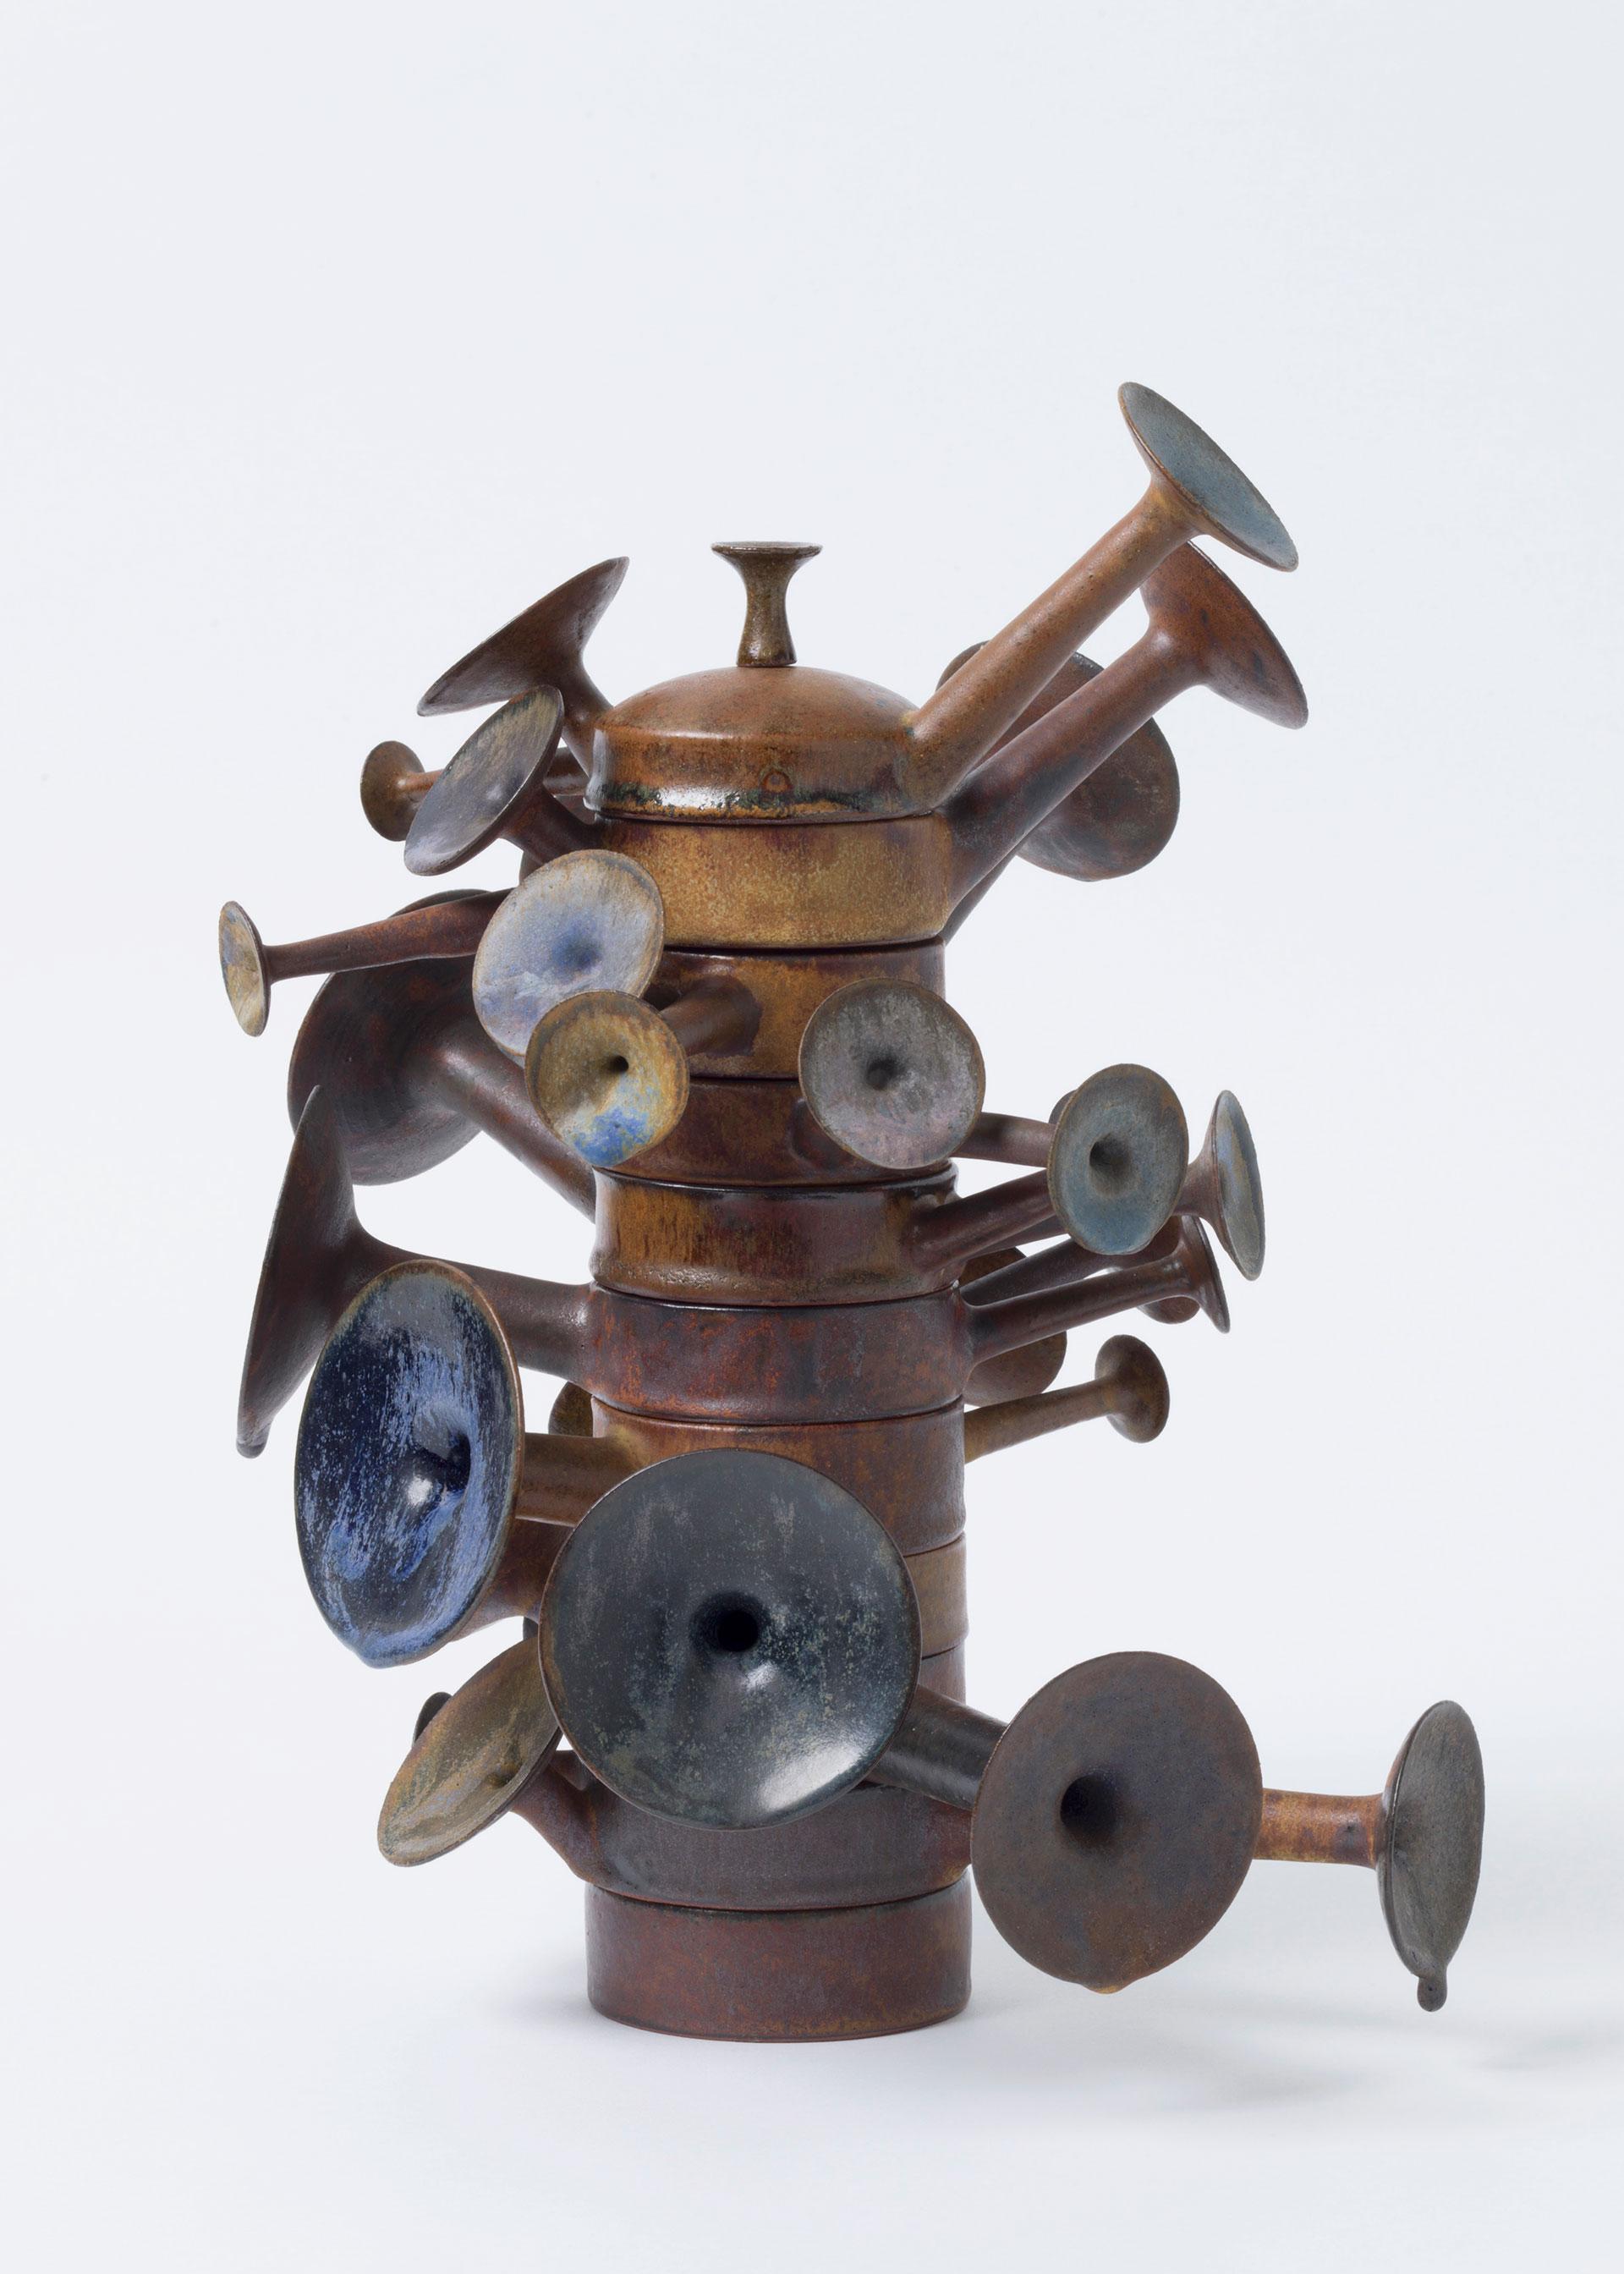 Beate Kuhn, Steinzeug, Keramik, Objekt, Trichterturm